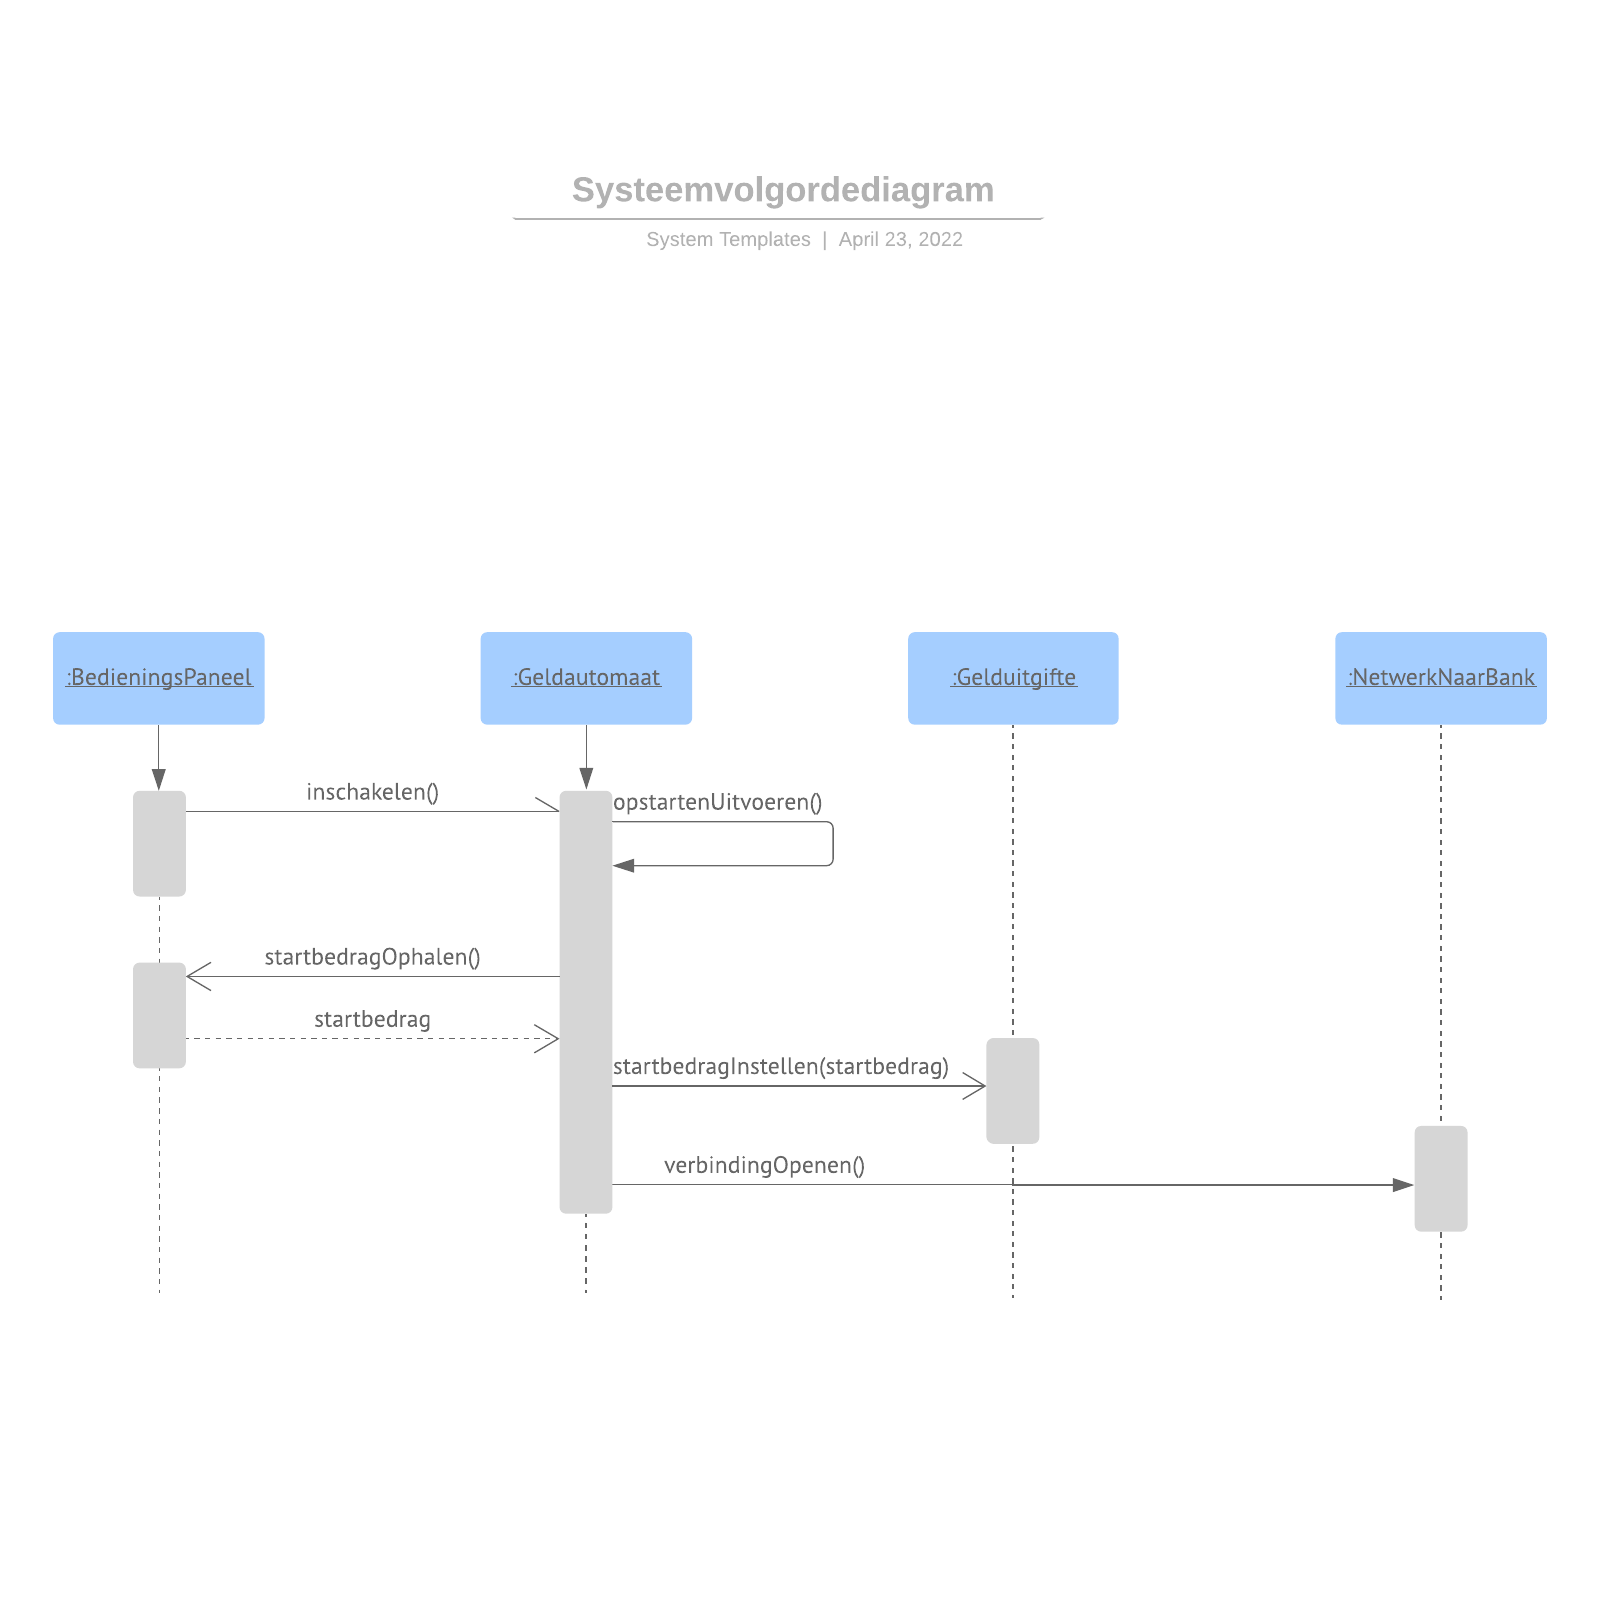 Systeemvolgordediagram